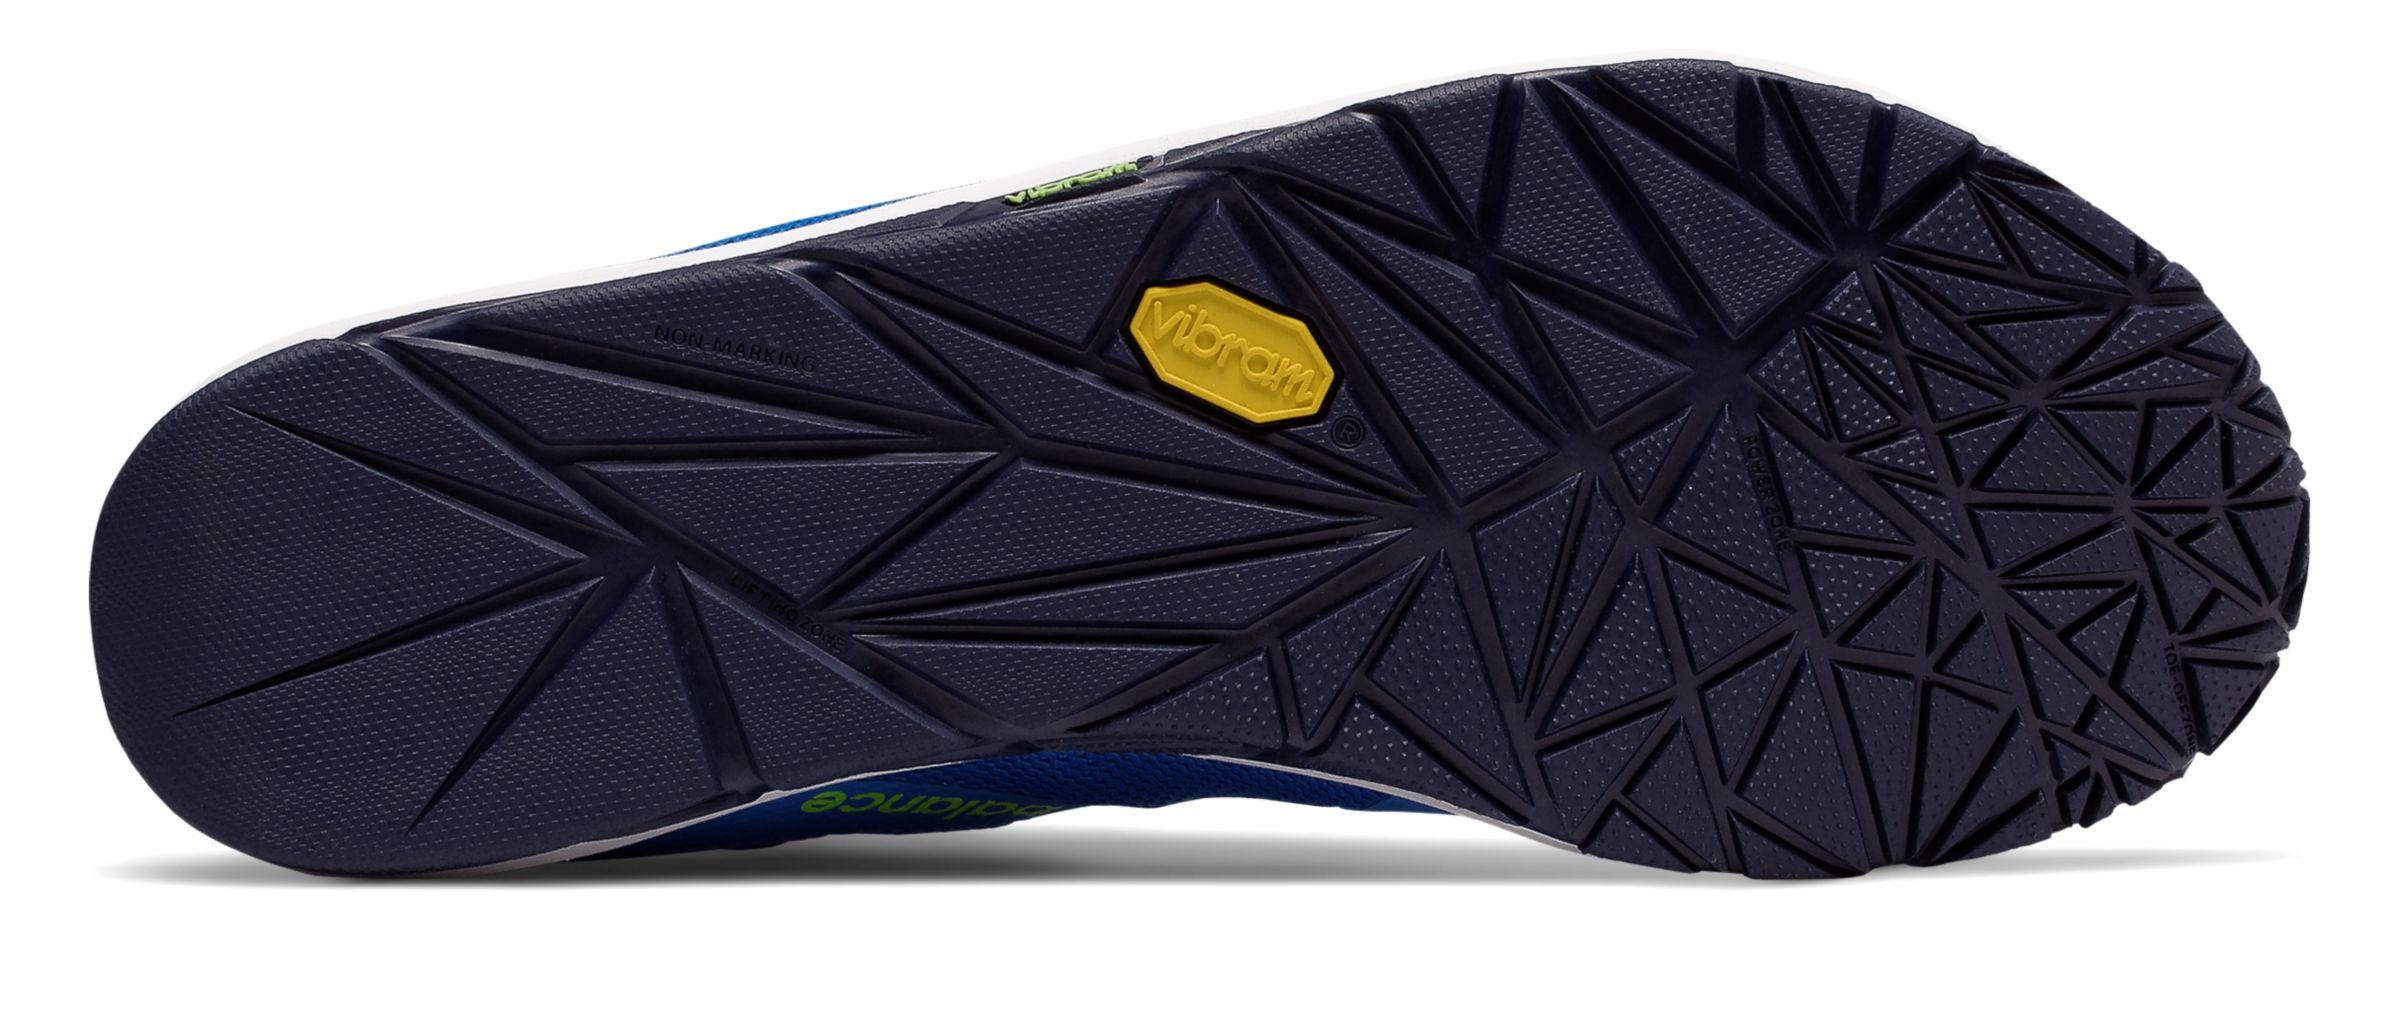 Men\u0027s Minimus 20v6 Cross Training Shoes | New Balance